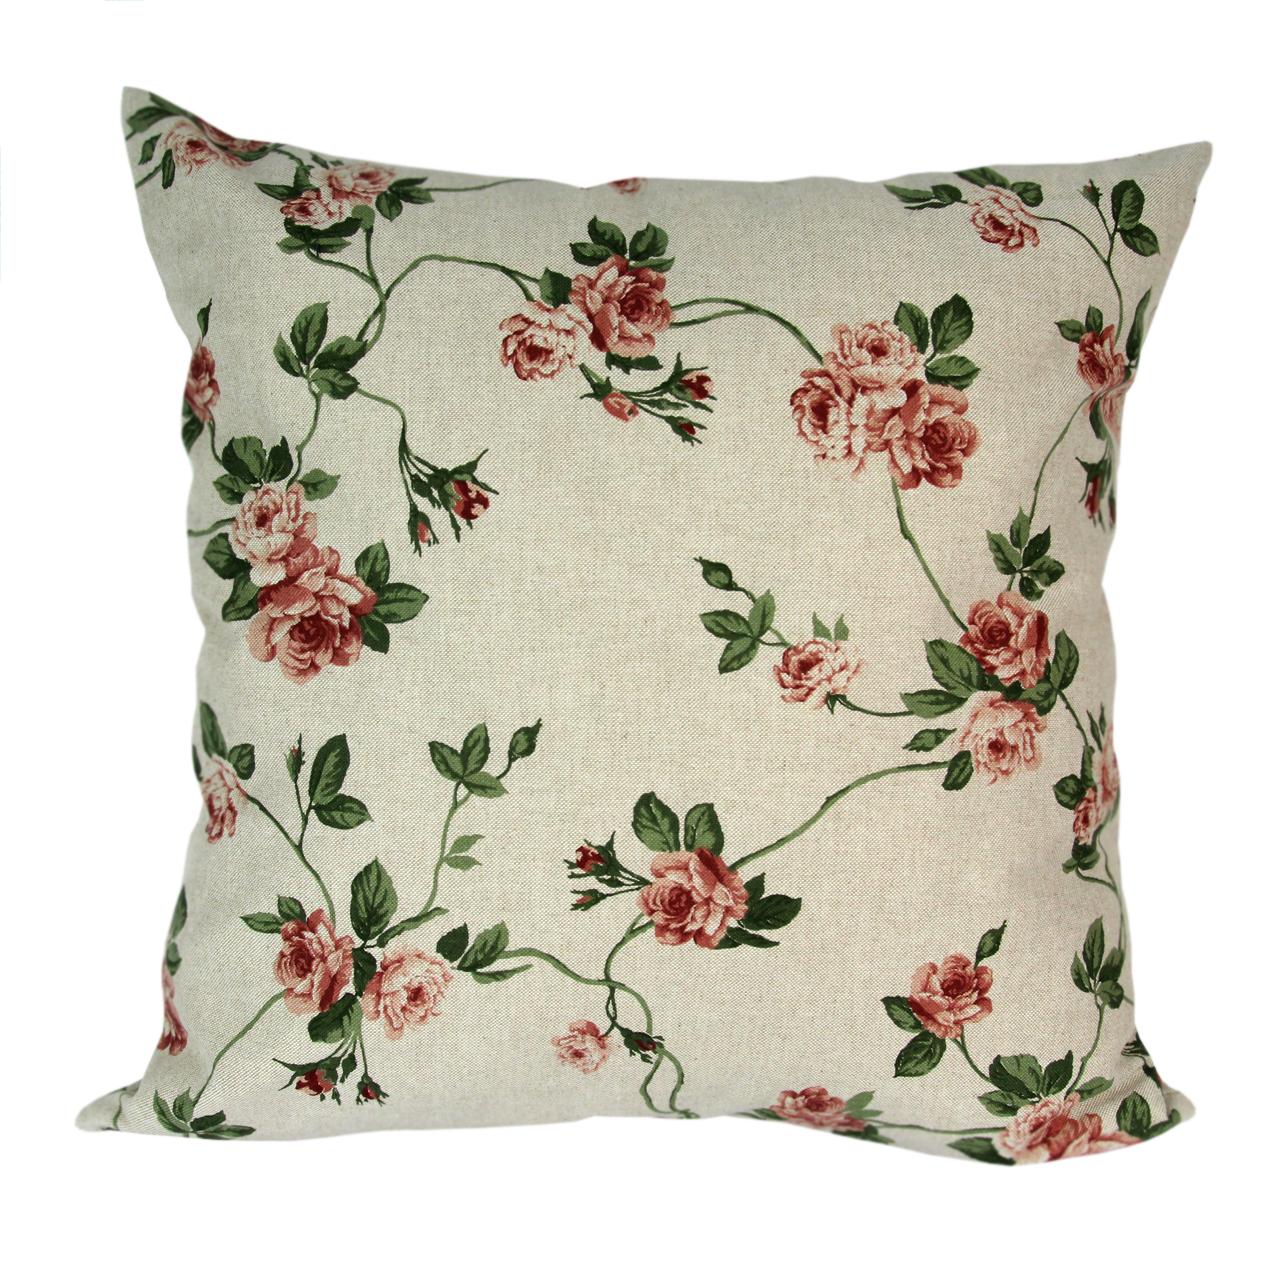 Fata De Perna Din Textil Natur Cu Trandafiri 40 Cm